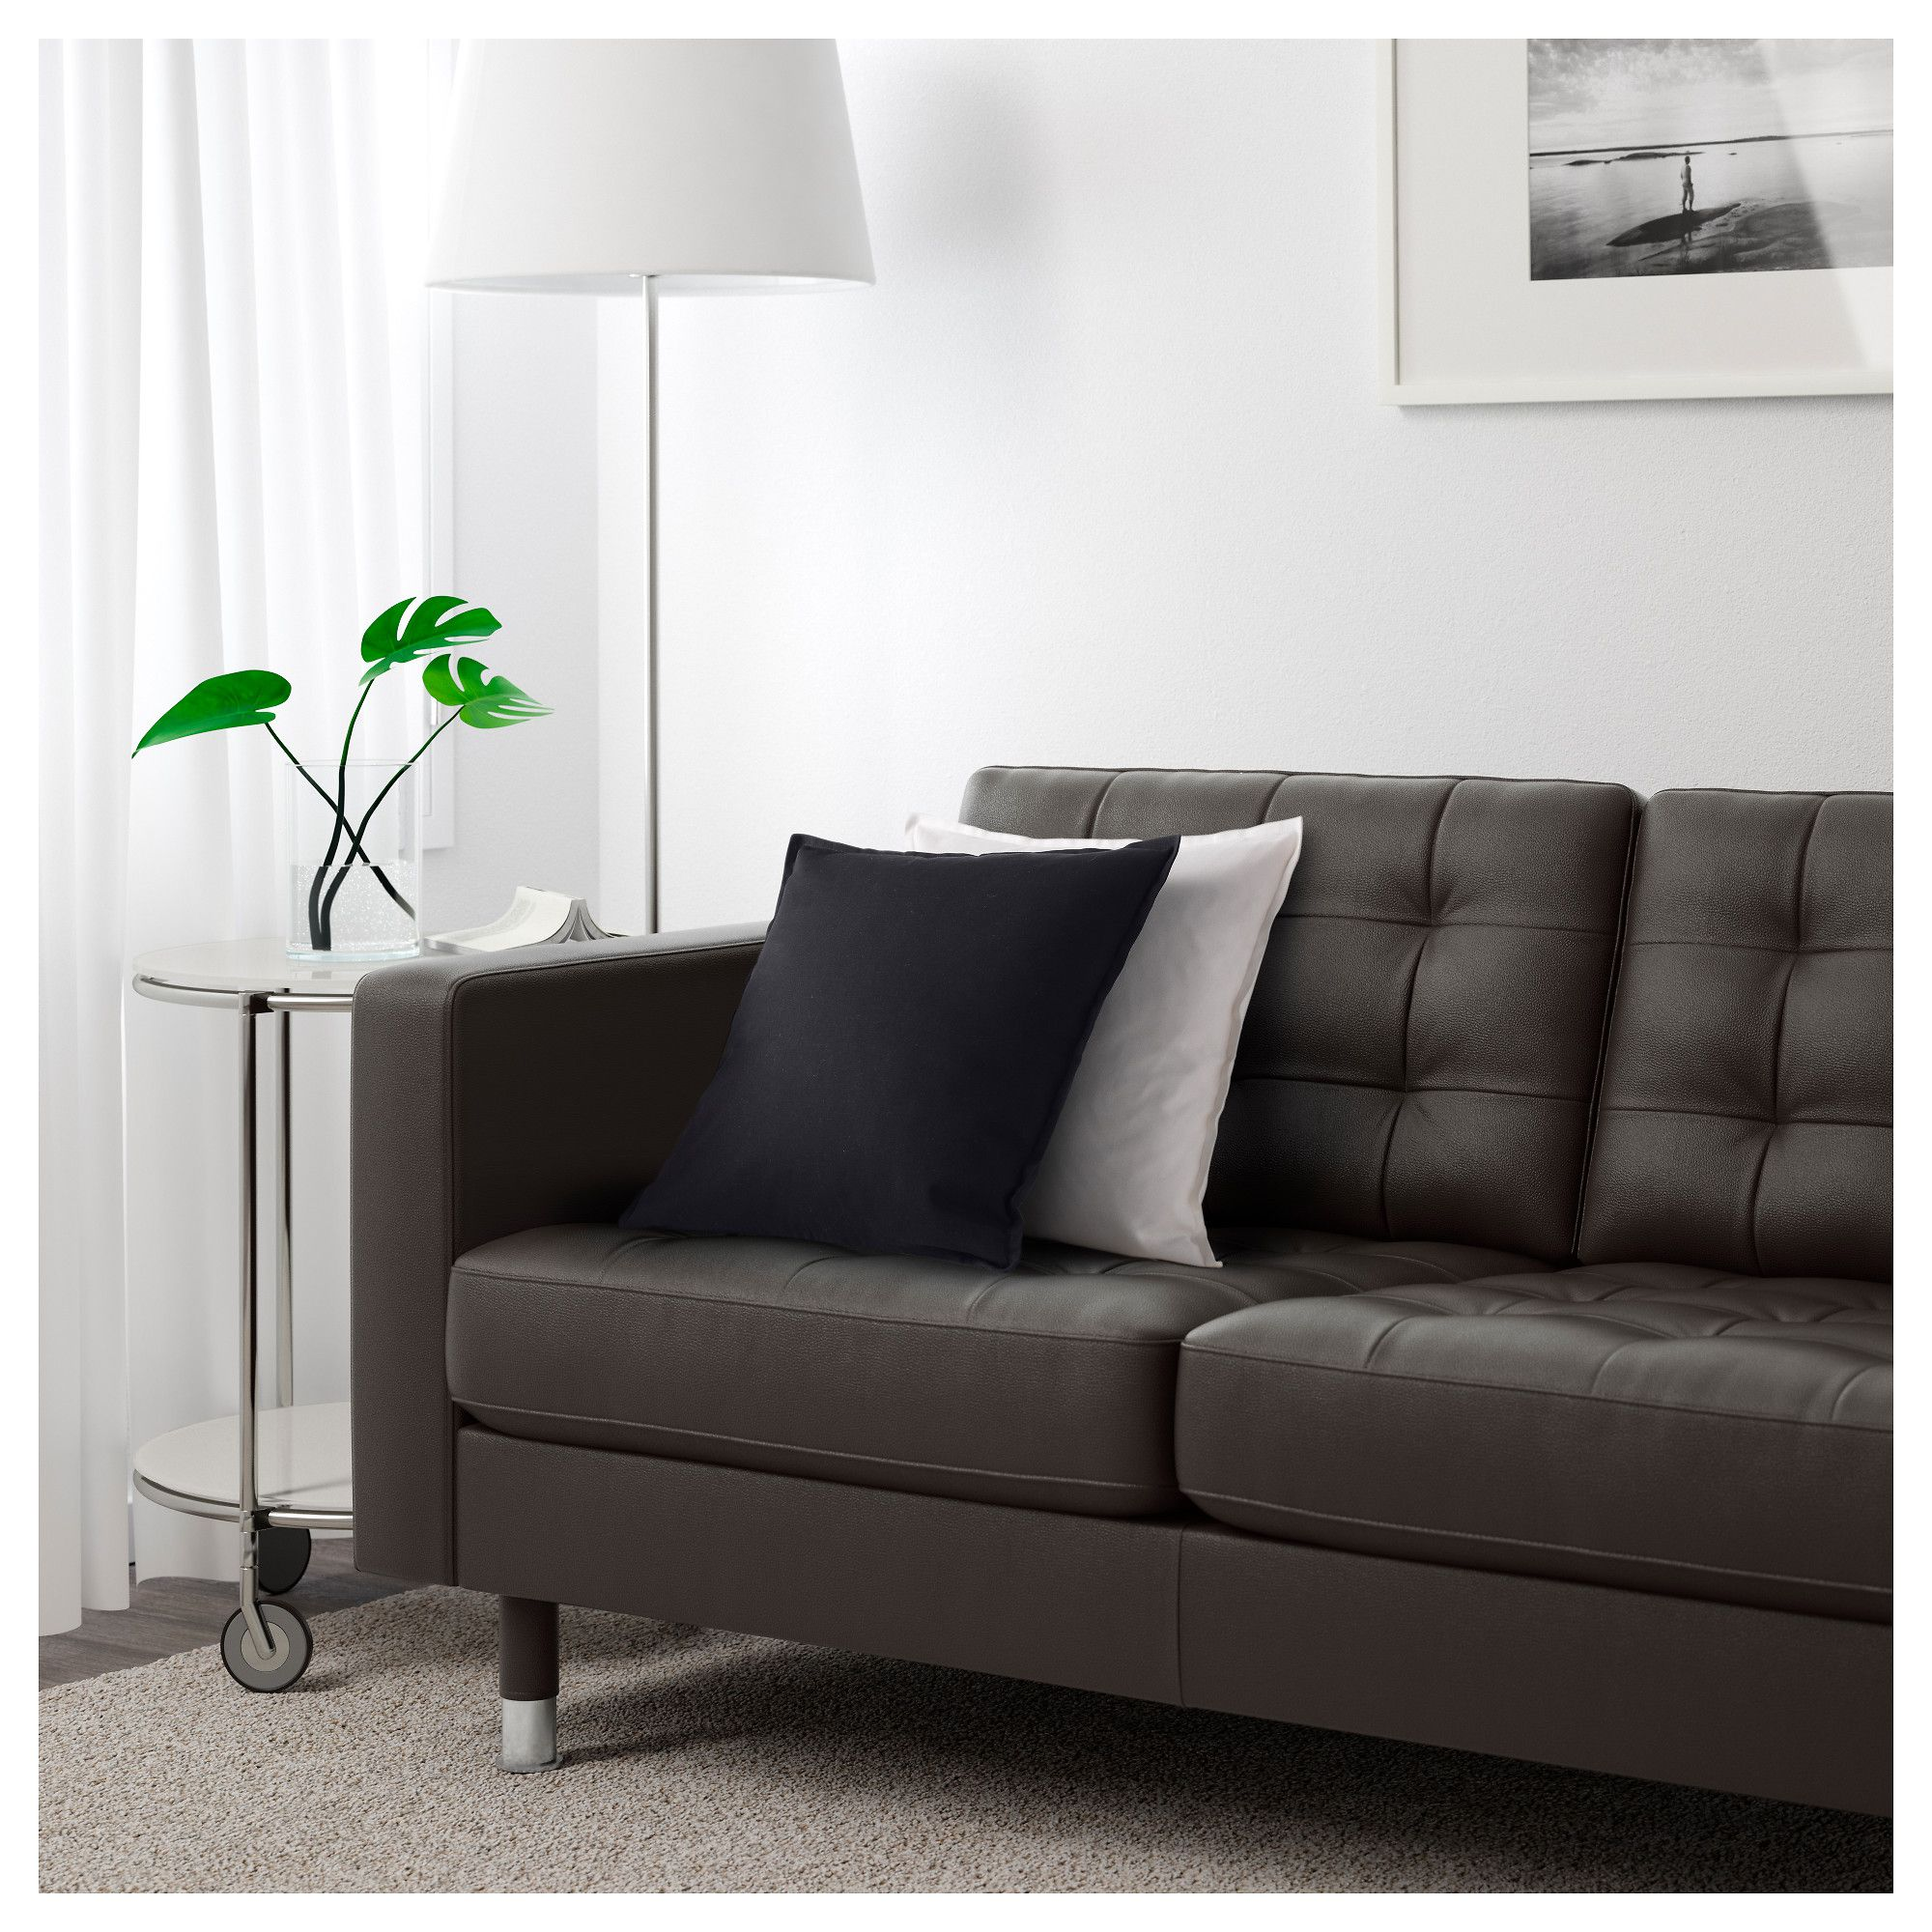 Sofa Table IKEA LANDSKRONA three seat sofa and chaise longue